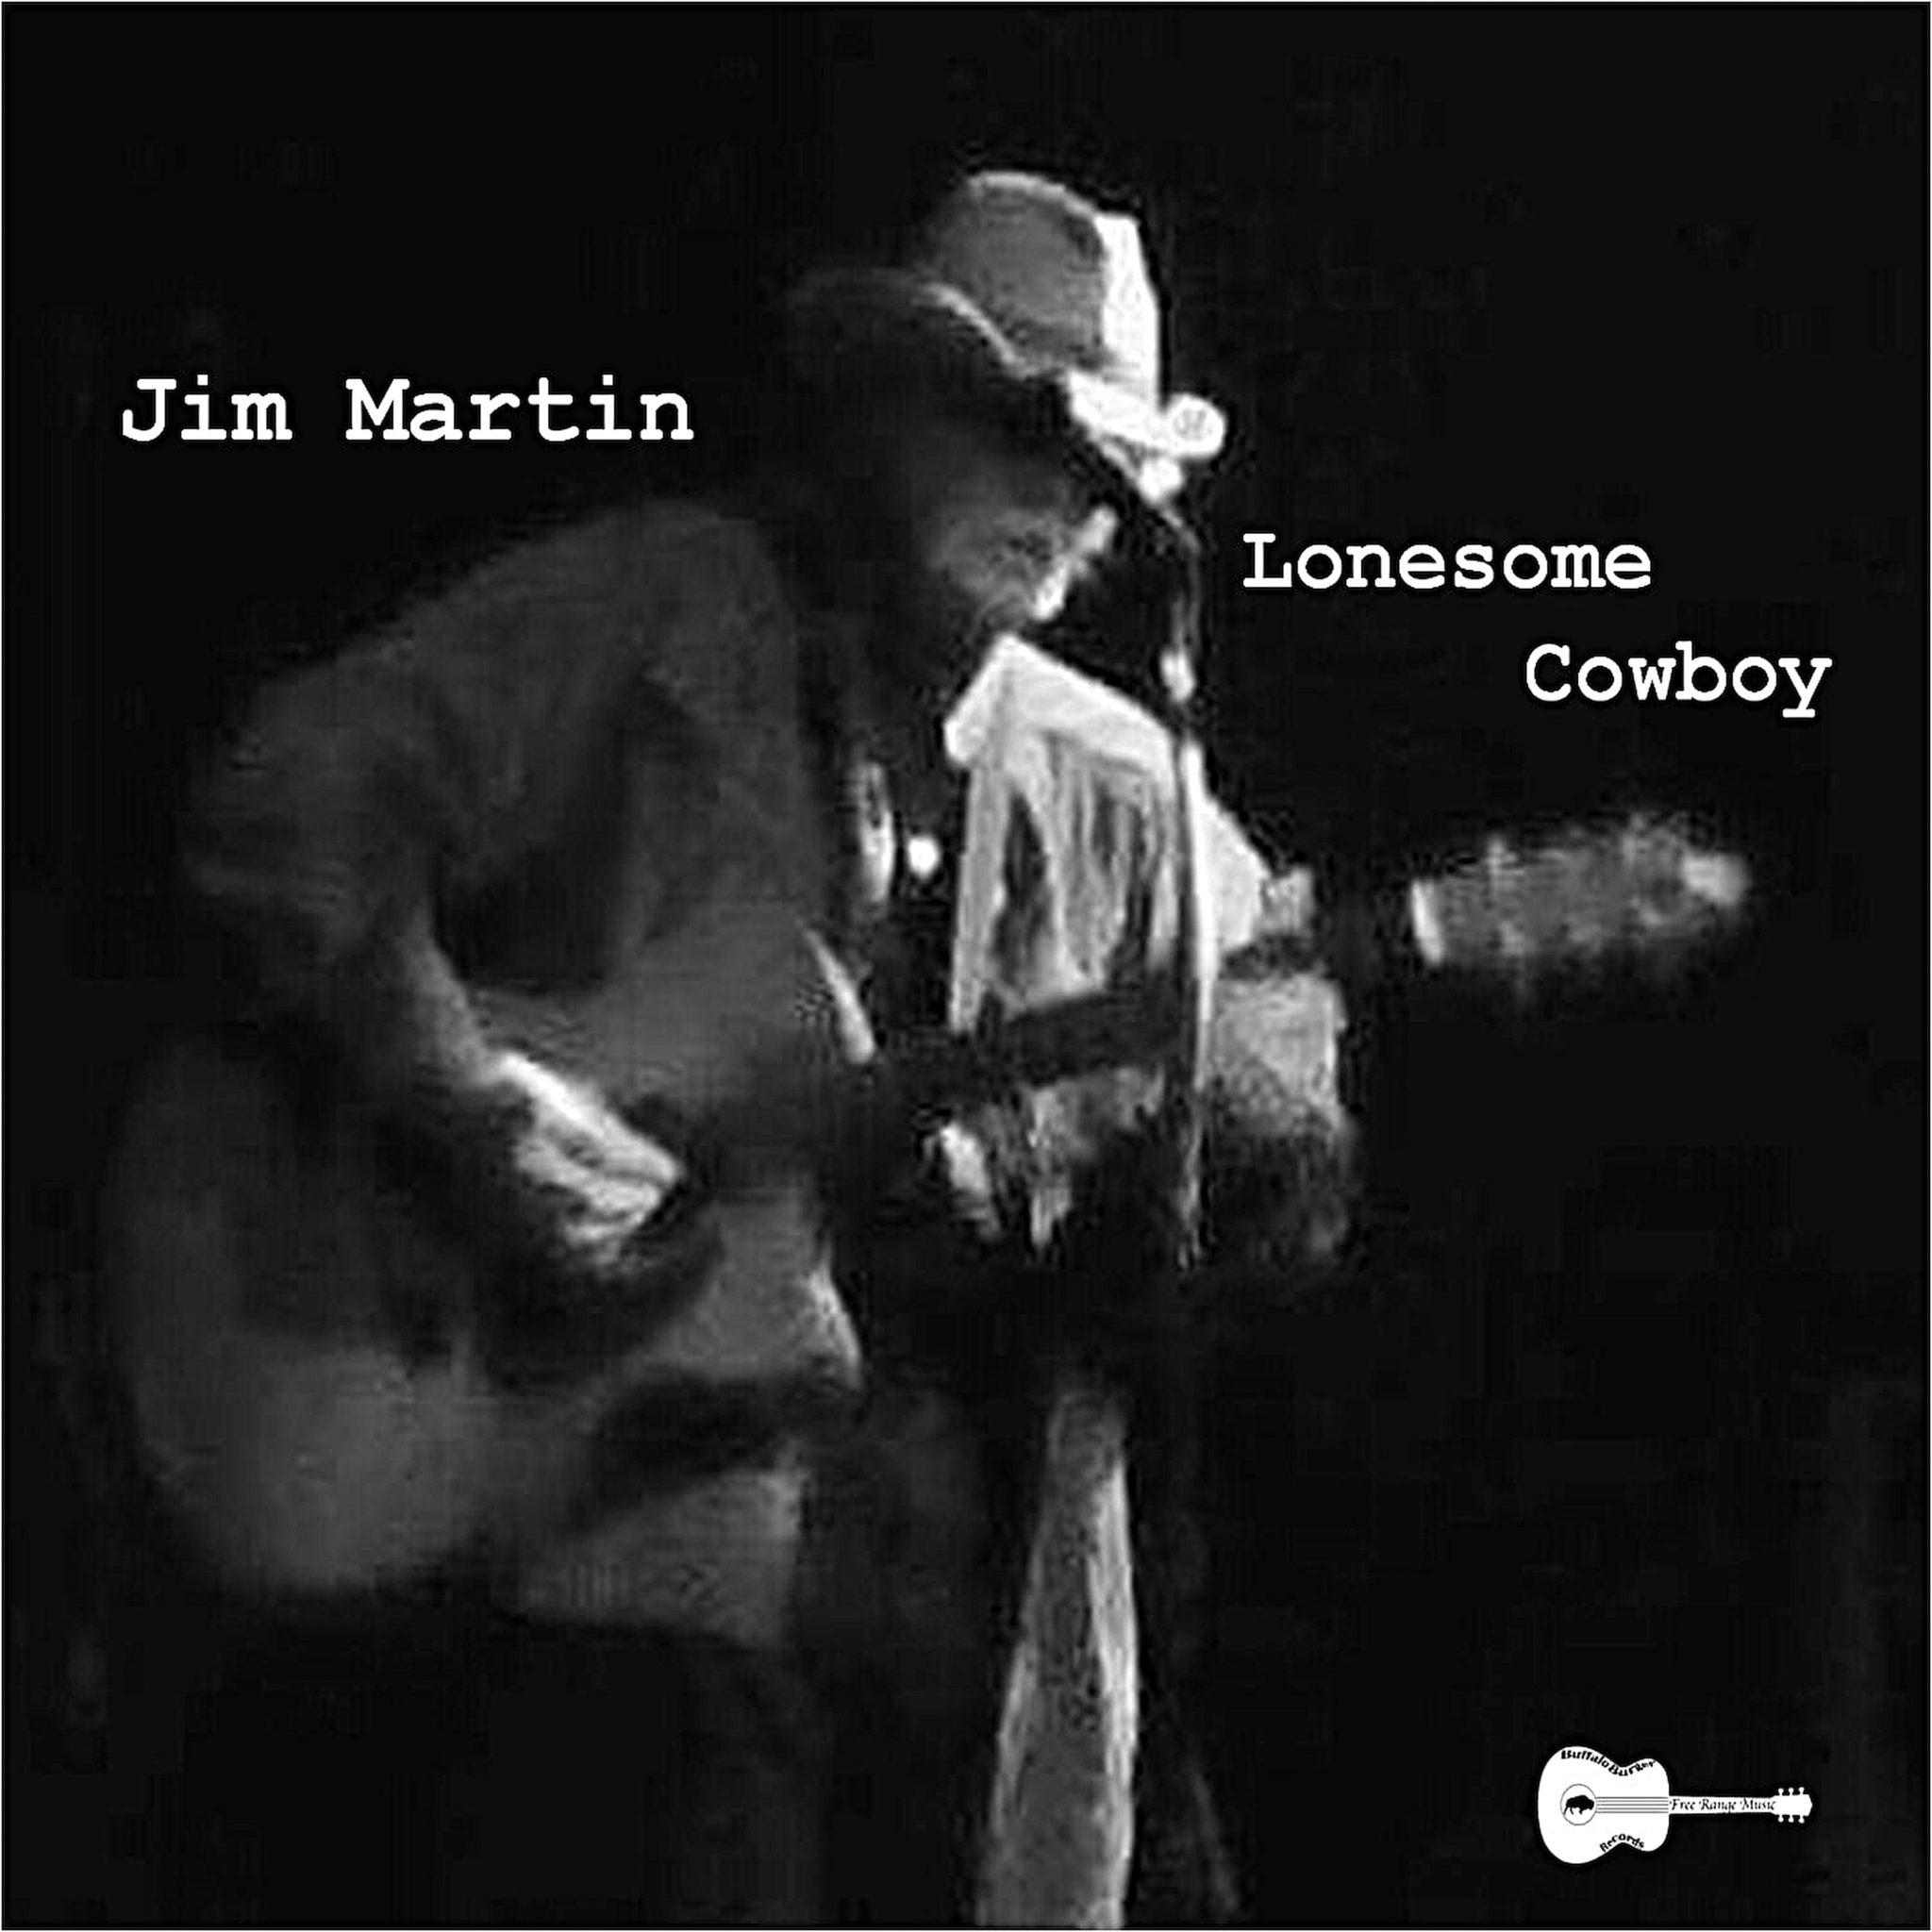 Jim Martin | Lonesome Cowboy Album Released